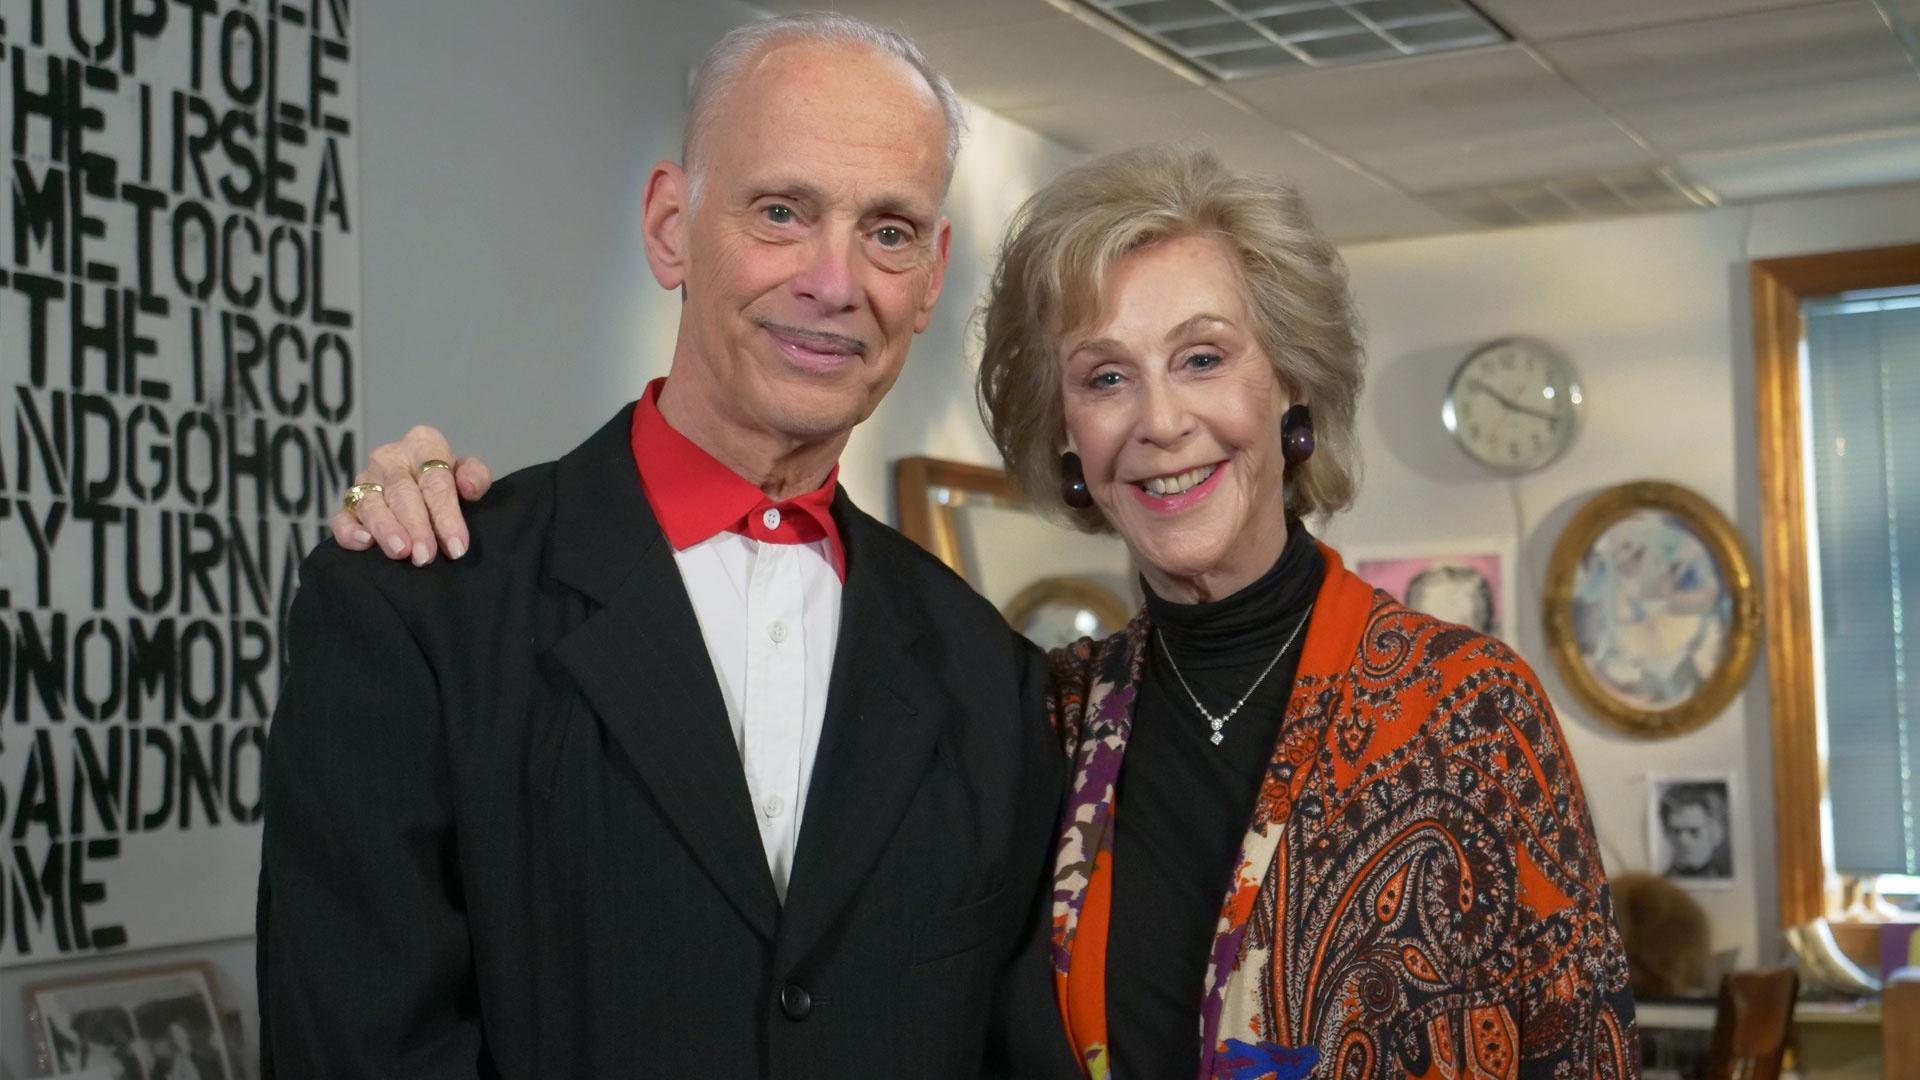 John Waters: An Artworks Special with Rhea Feikin